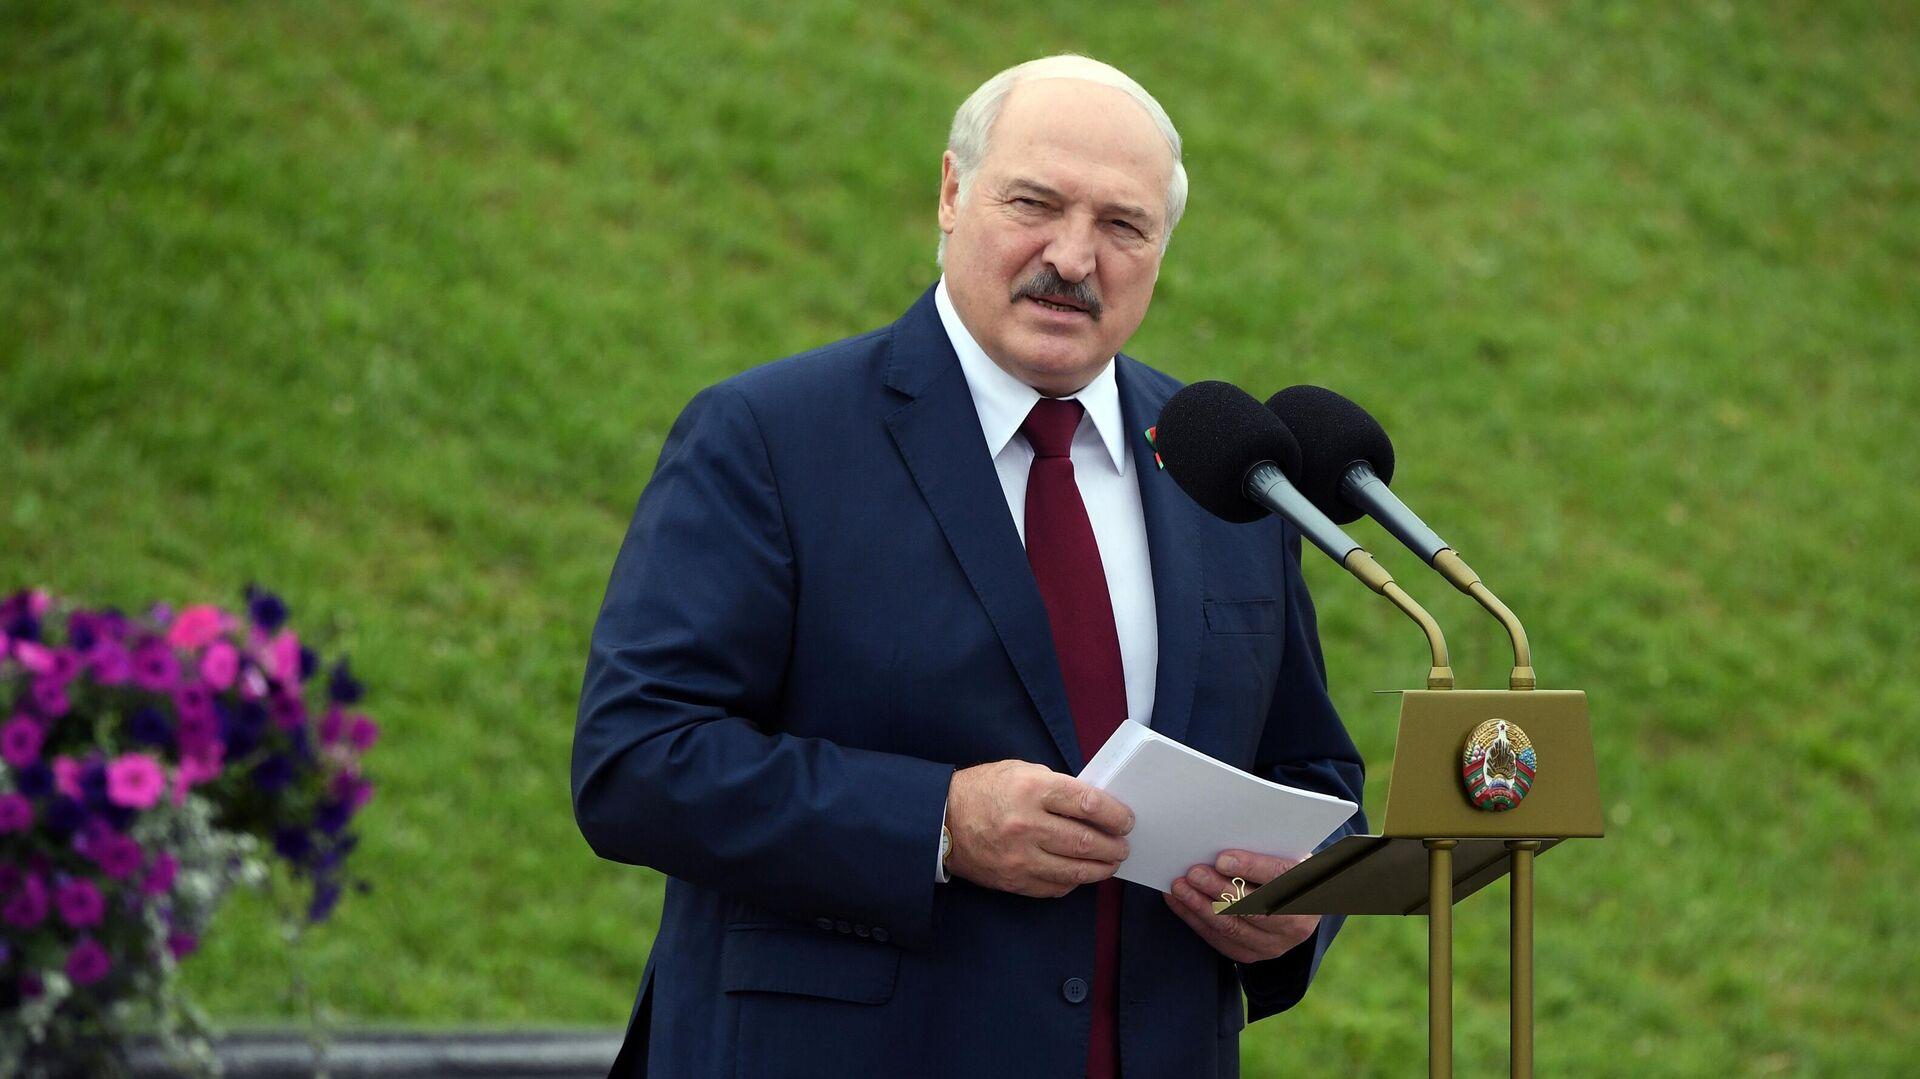 Президент Белоруссии Александр Лукашенко - Sputnik Таджикистан, 1920, 30.07.2021